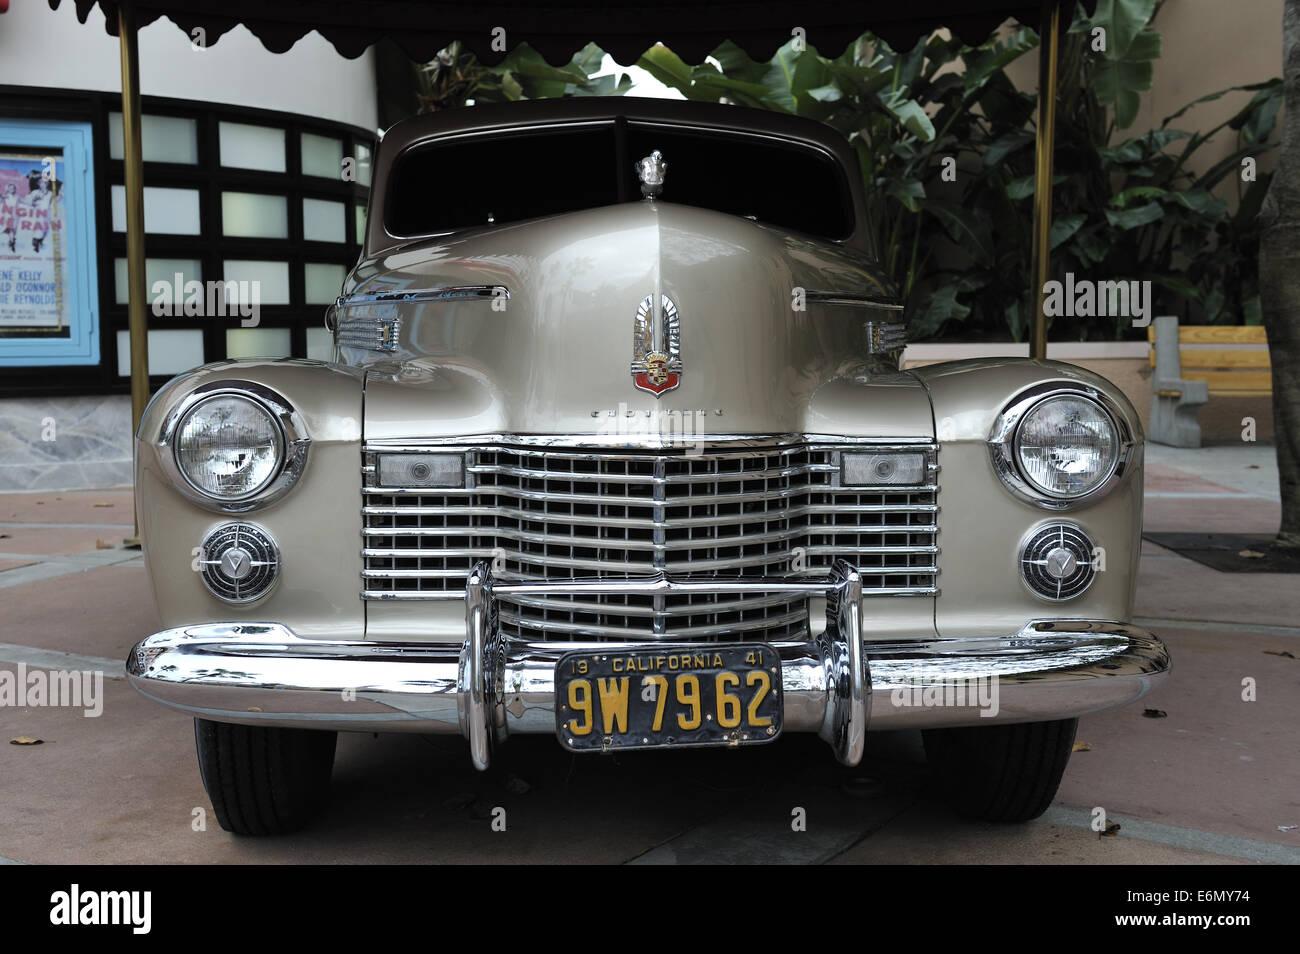 Classic vintage Cadillac. Disney's Hollywood Studios, Orlando, Florida, USA - Stock Image